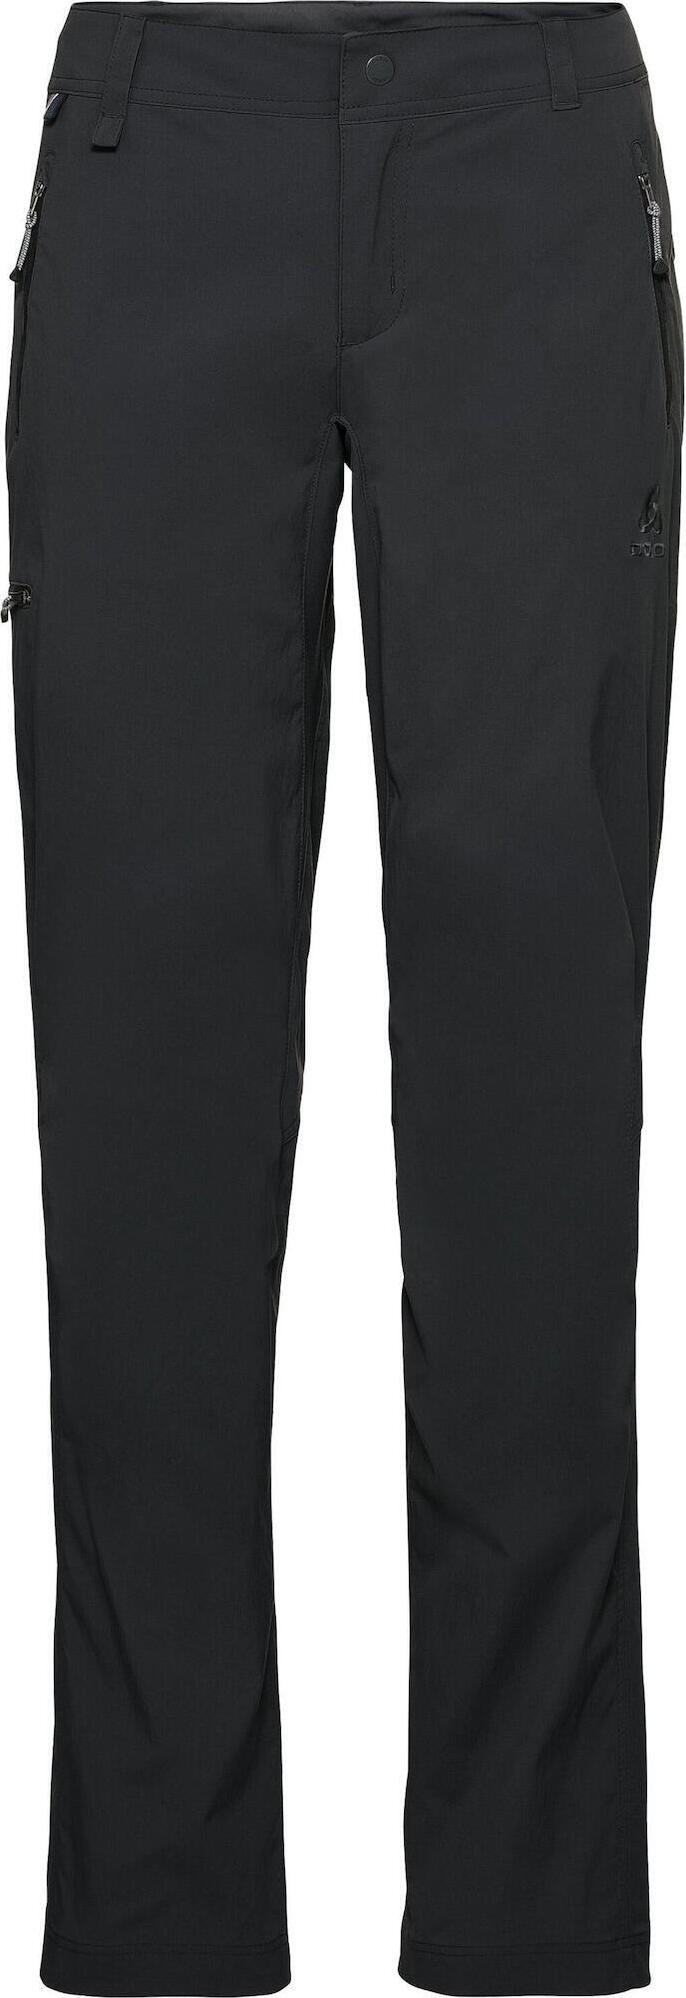 Odlo Damen Pants Short Length Wedgemount Hose